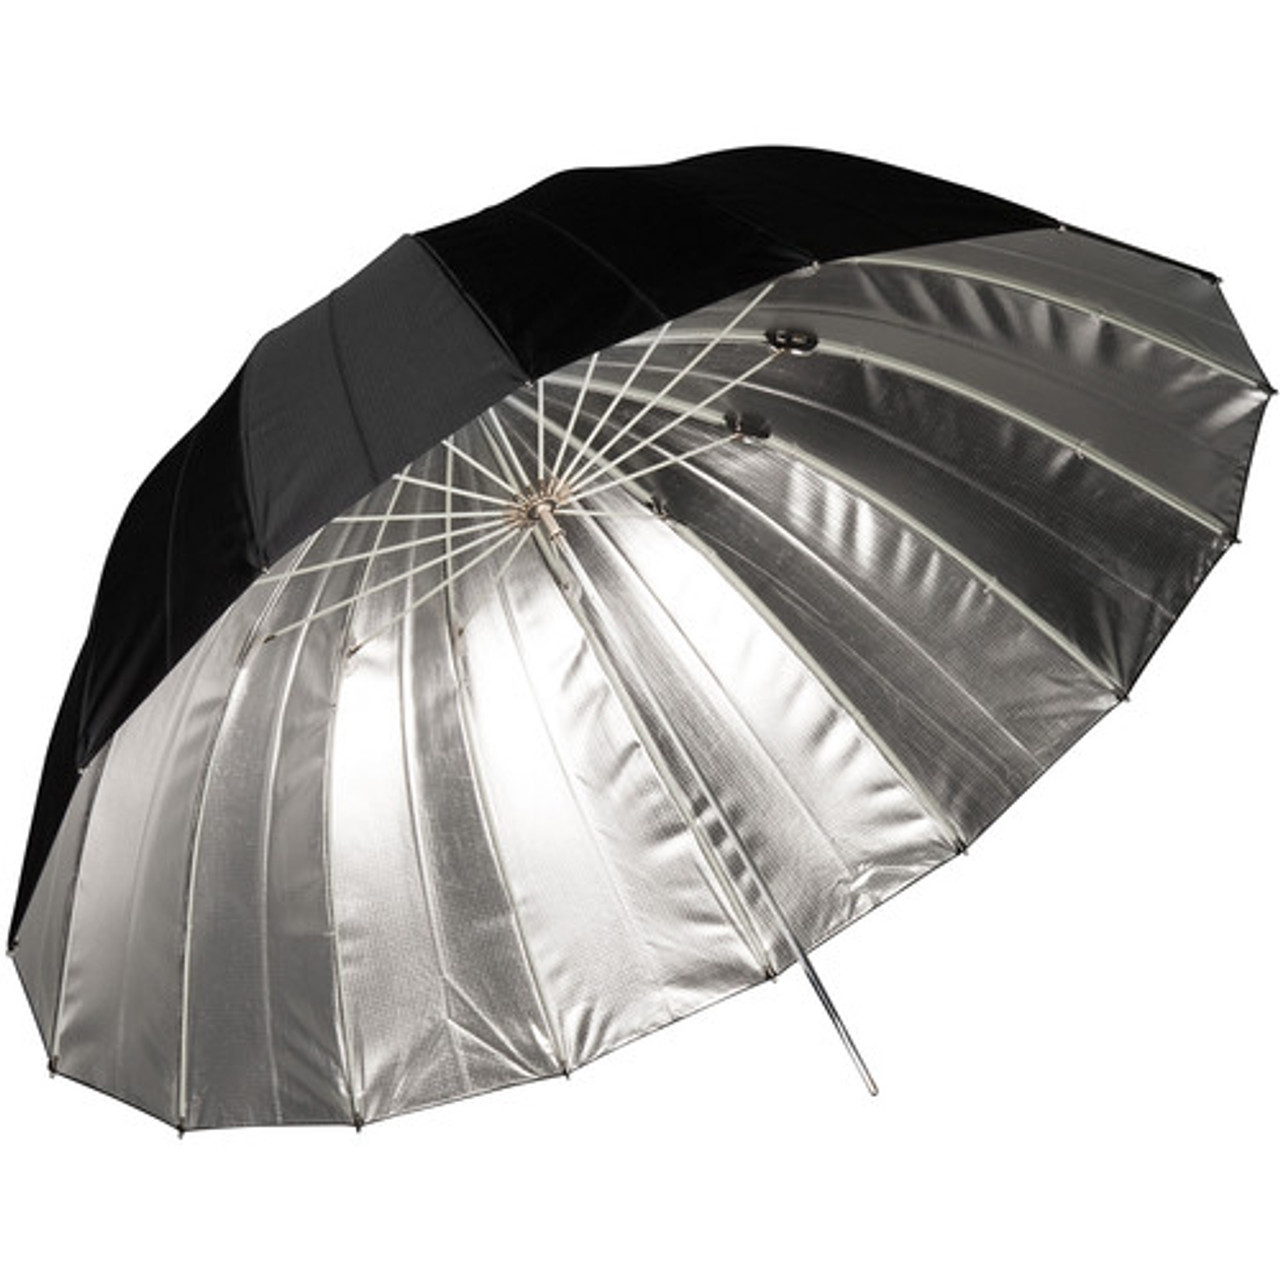 Apollo Deep Umbrella Westcott 53 in Silver